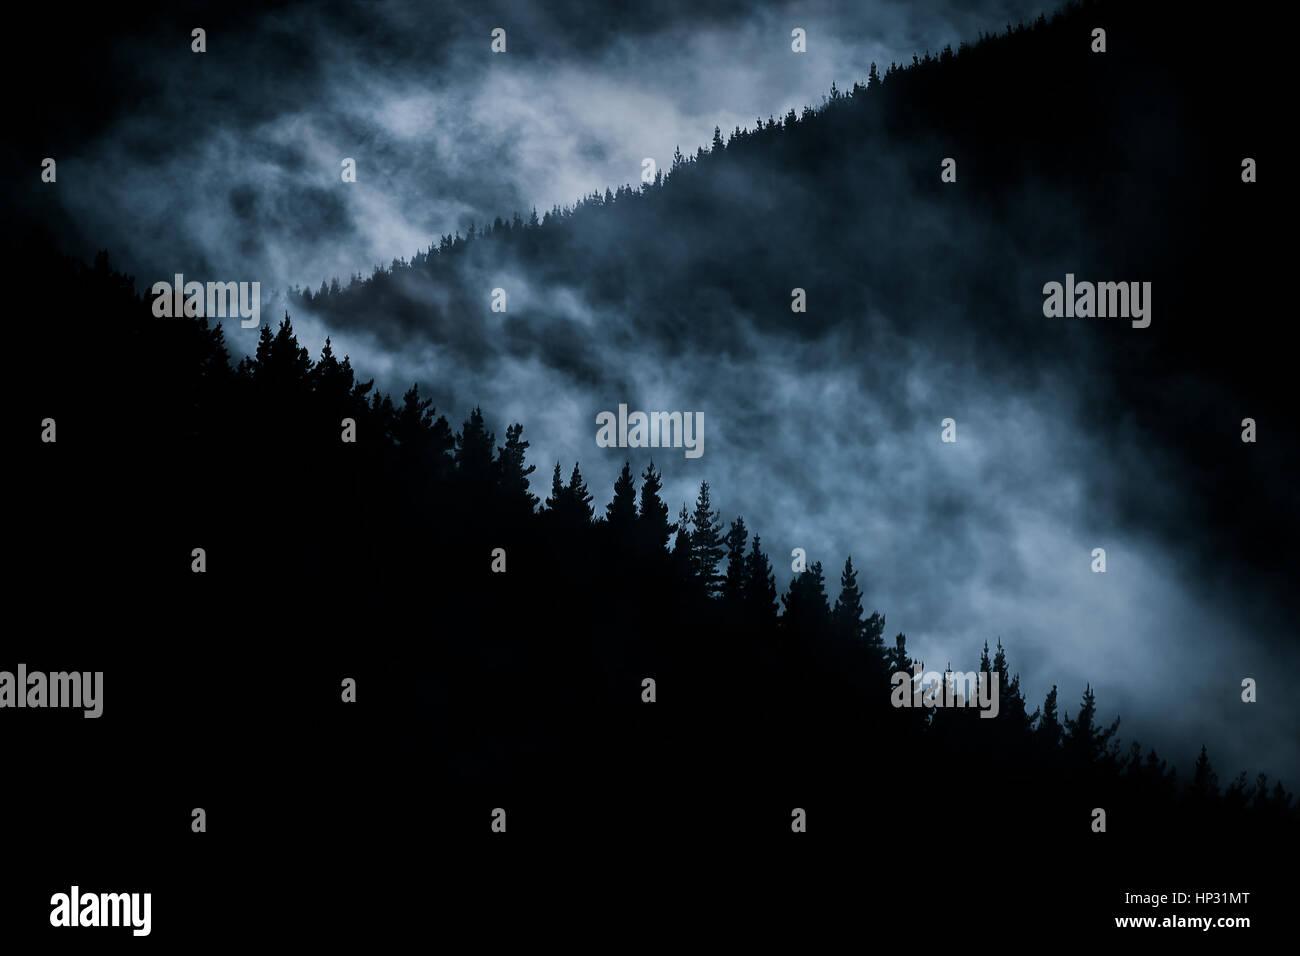 Scary foggy mountain al night Immagini Stock